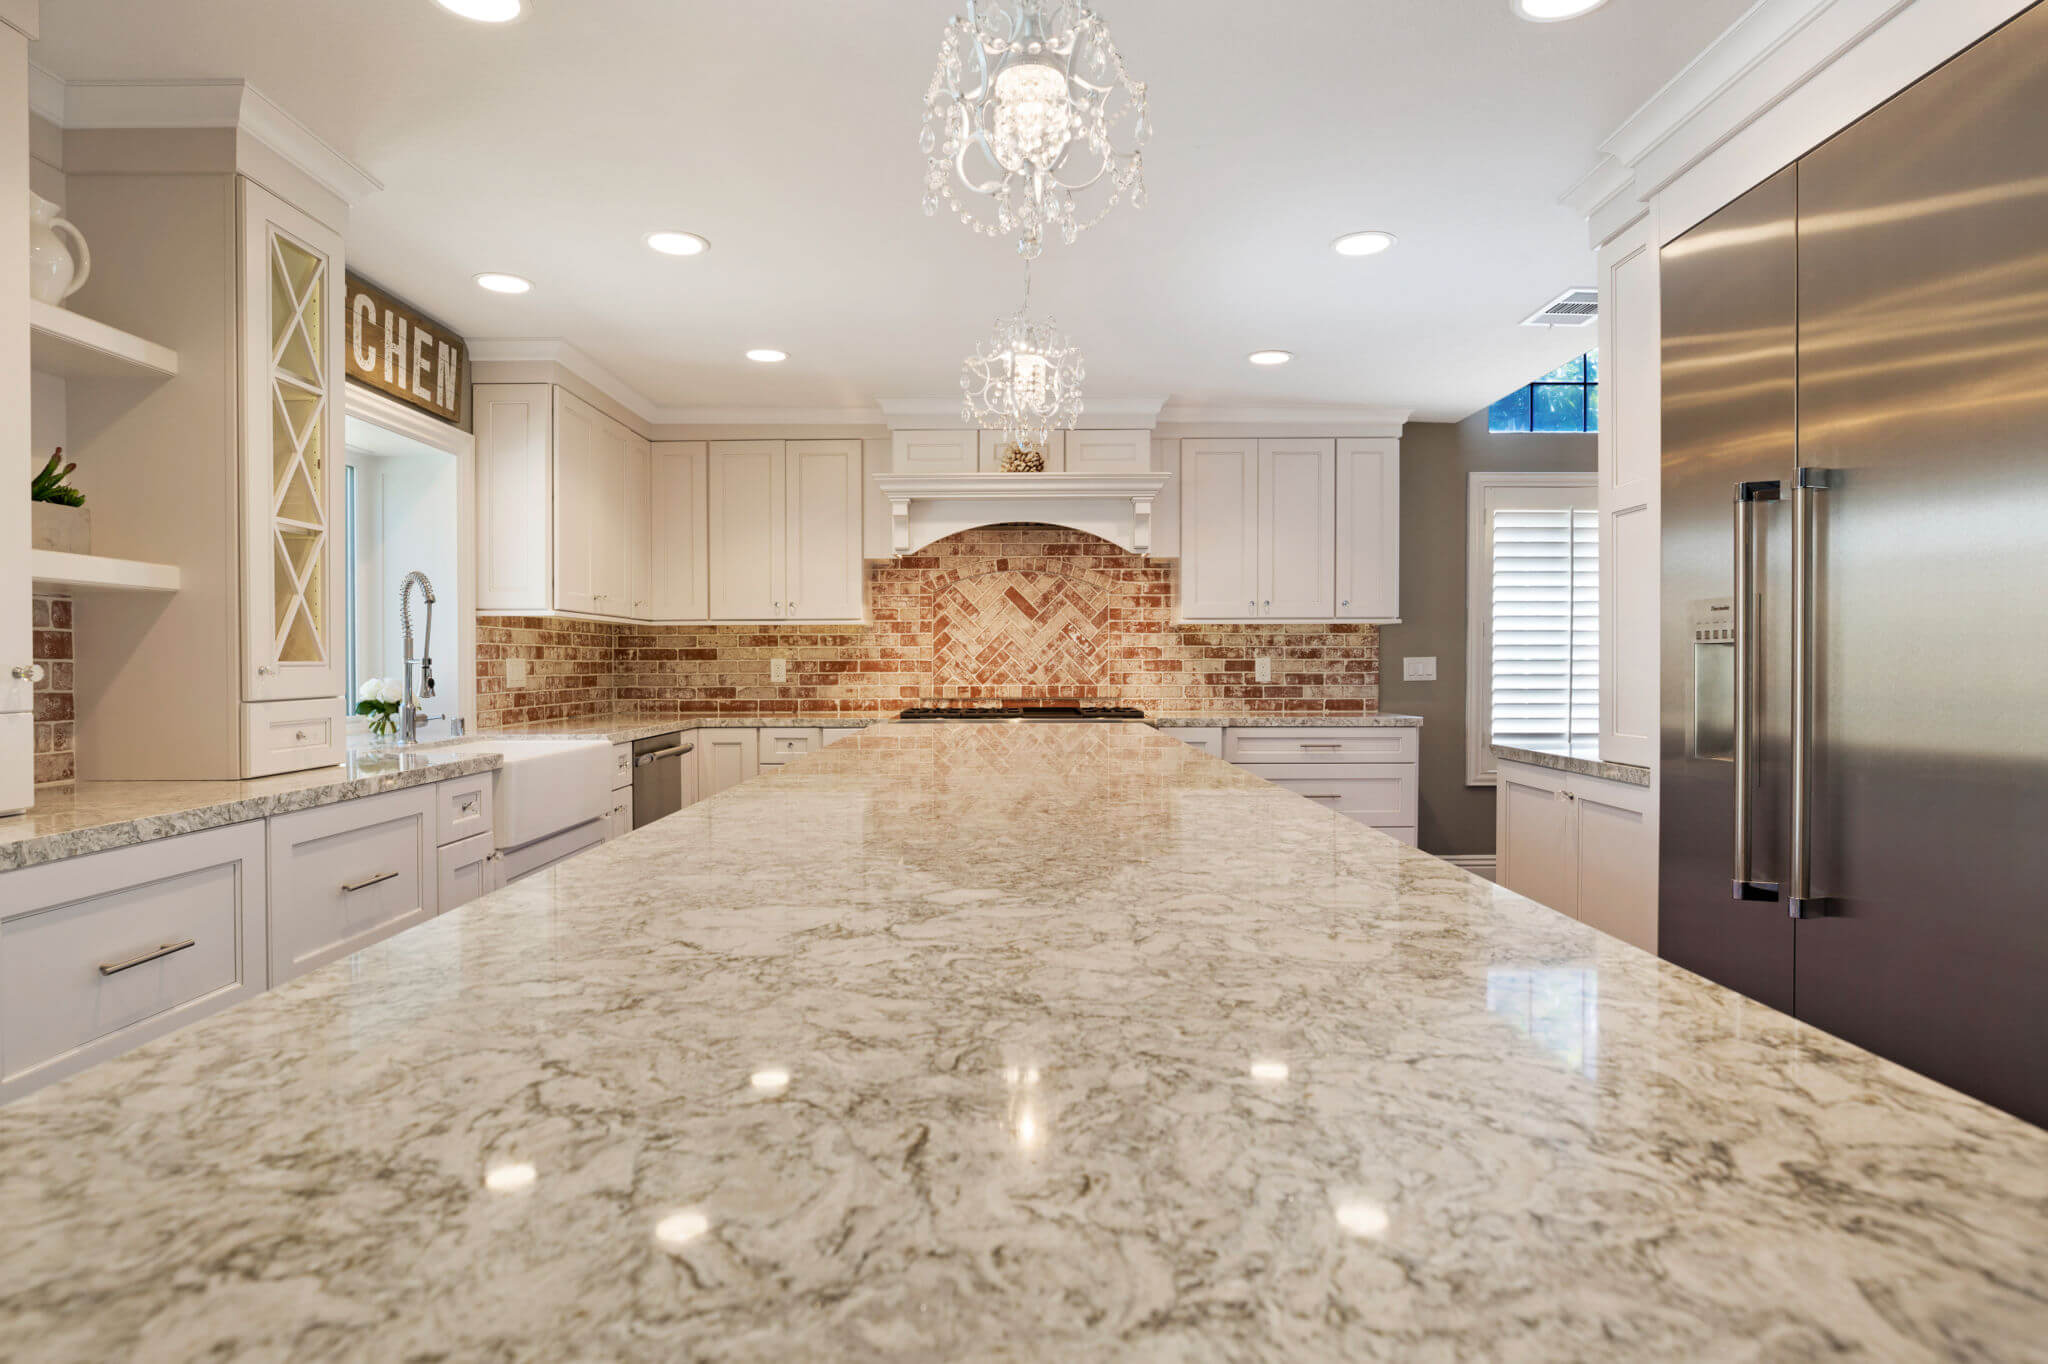 Quarts Kitchen Island, Luxury Kitchen Remodel Orange County